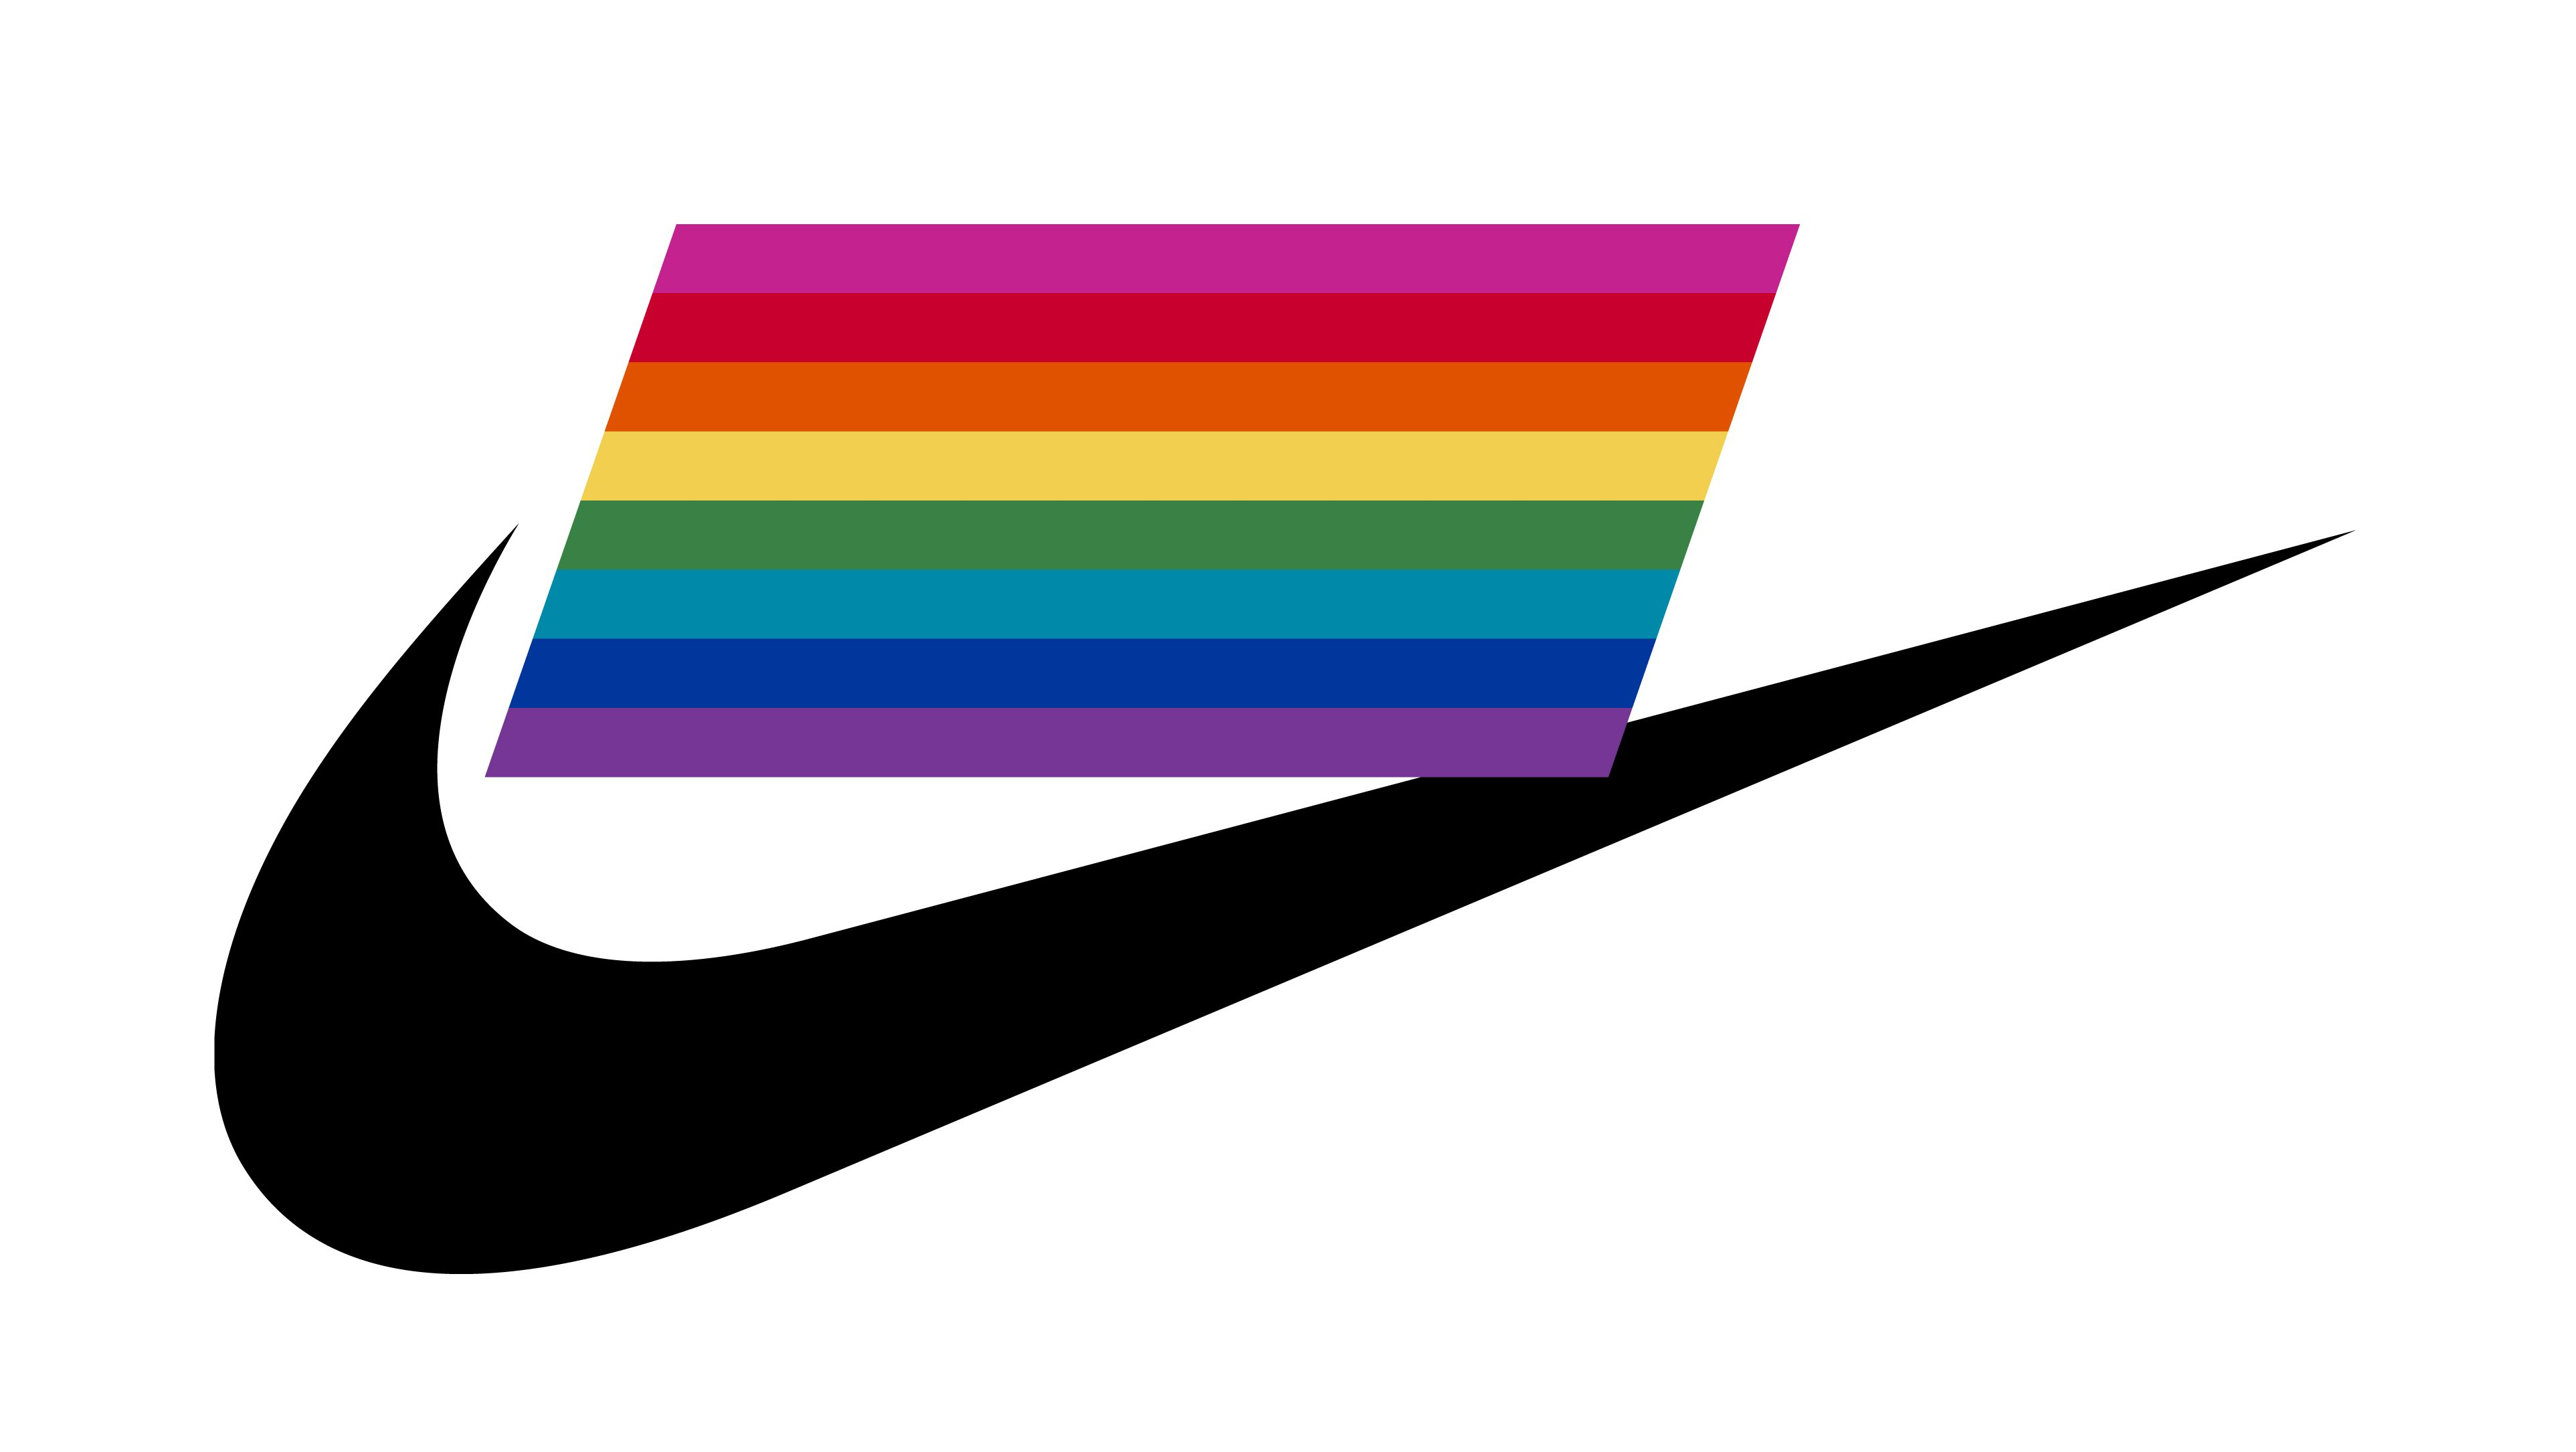 Excavación análisis capa  Nike 'Be True' 2019 Pride Shoes Collection: Release Date & Price Info –  Footwear News